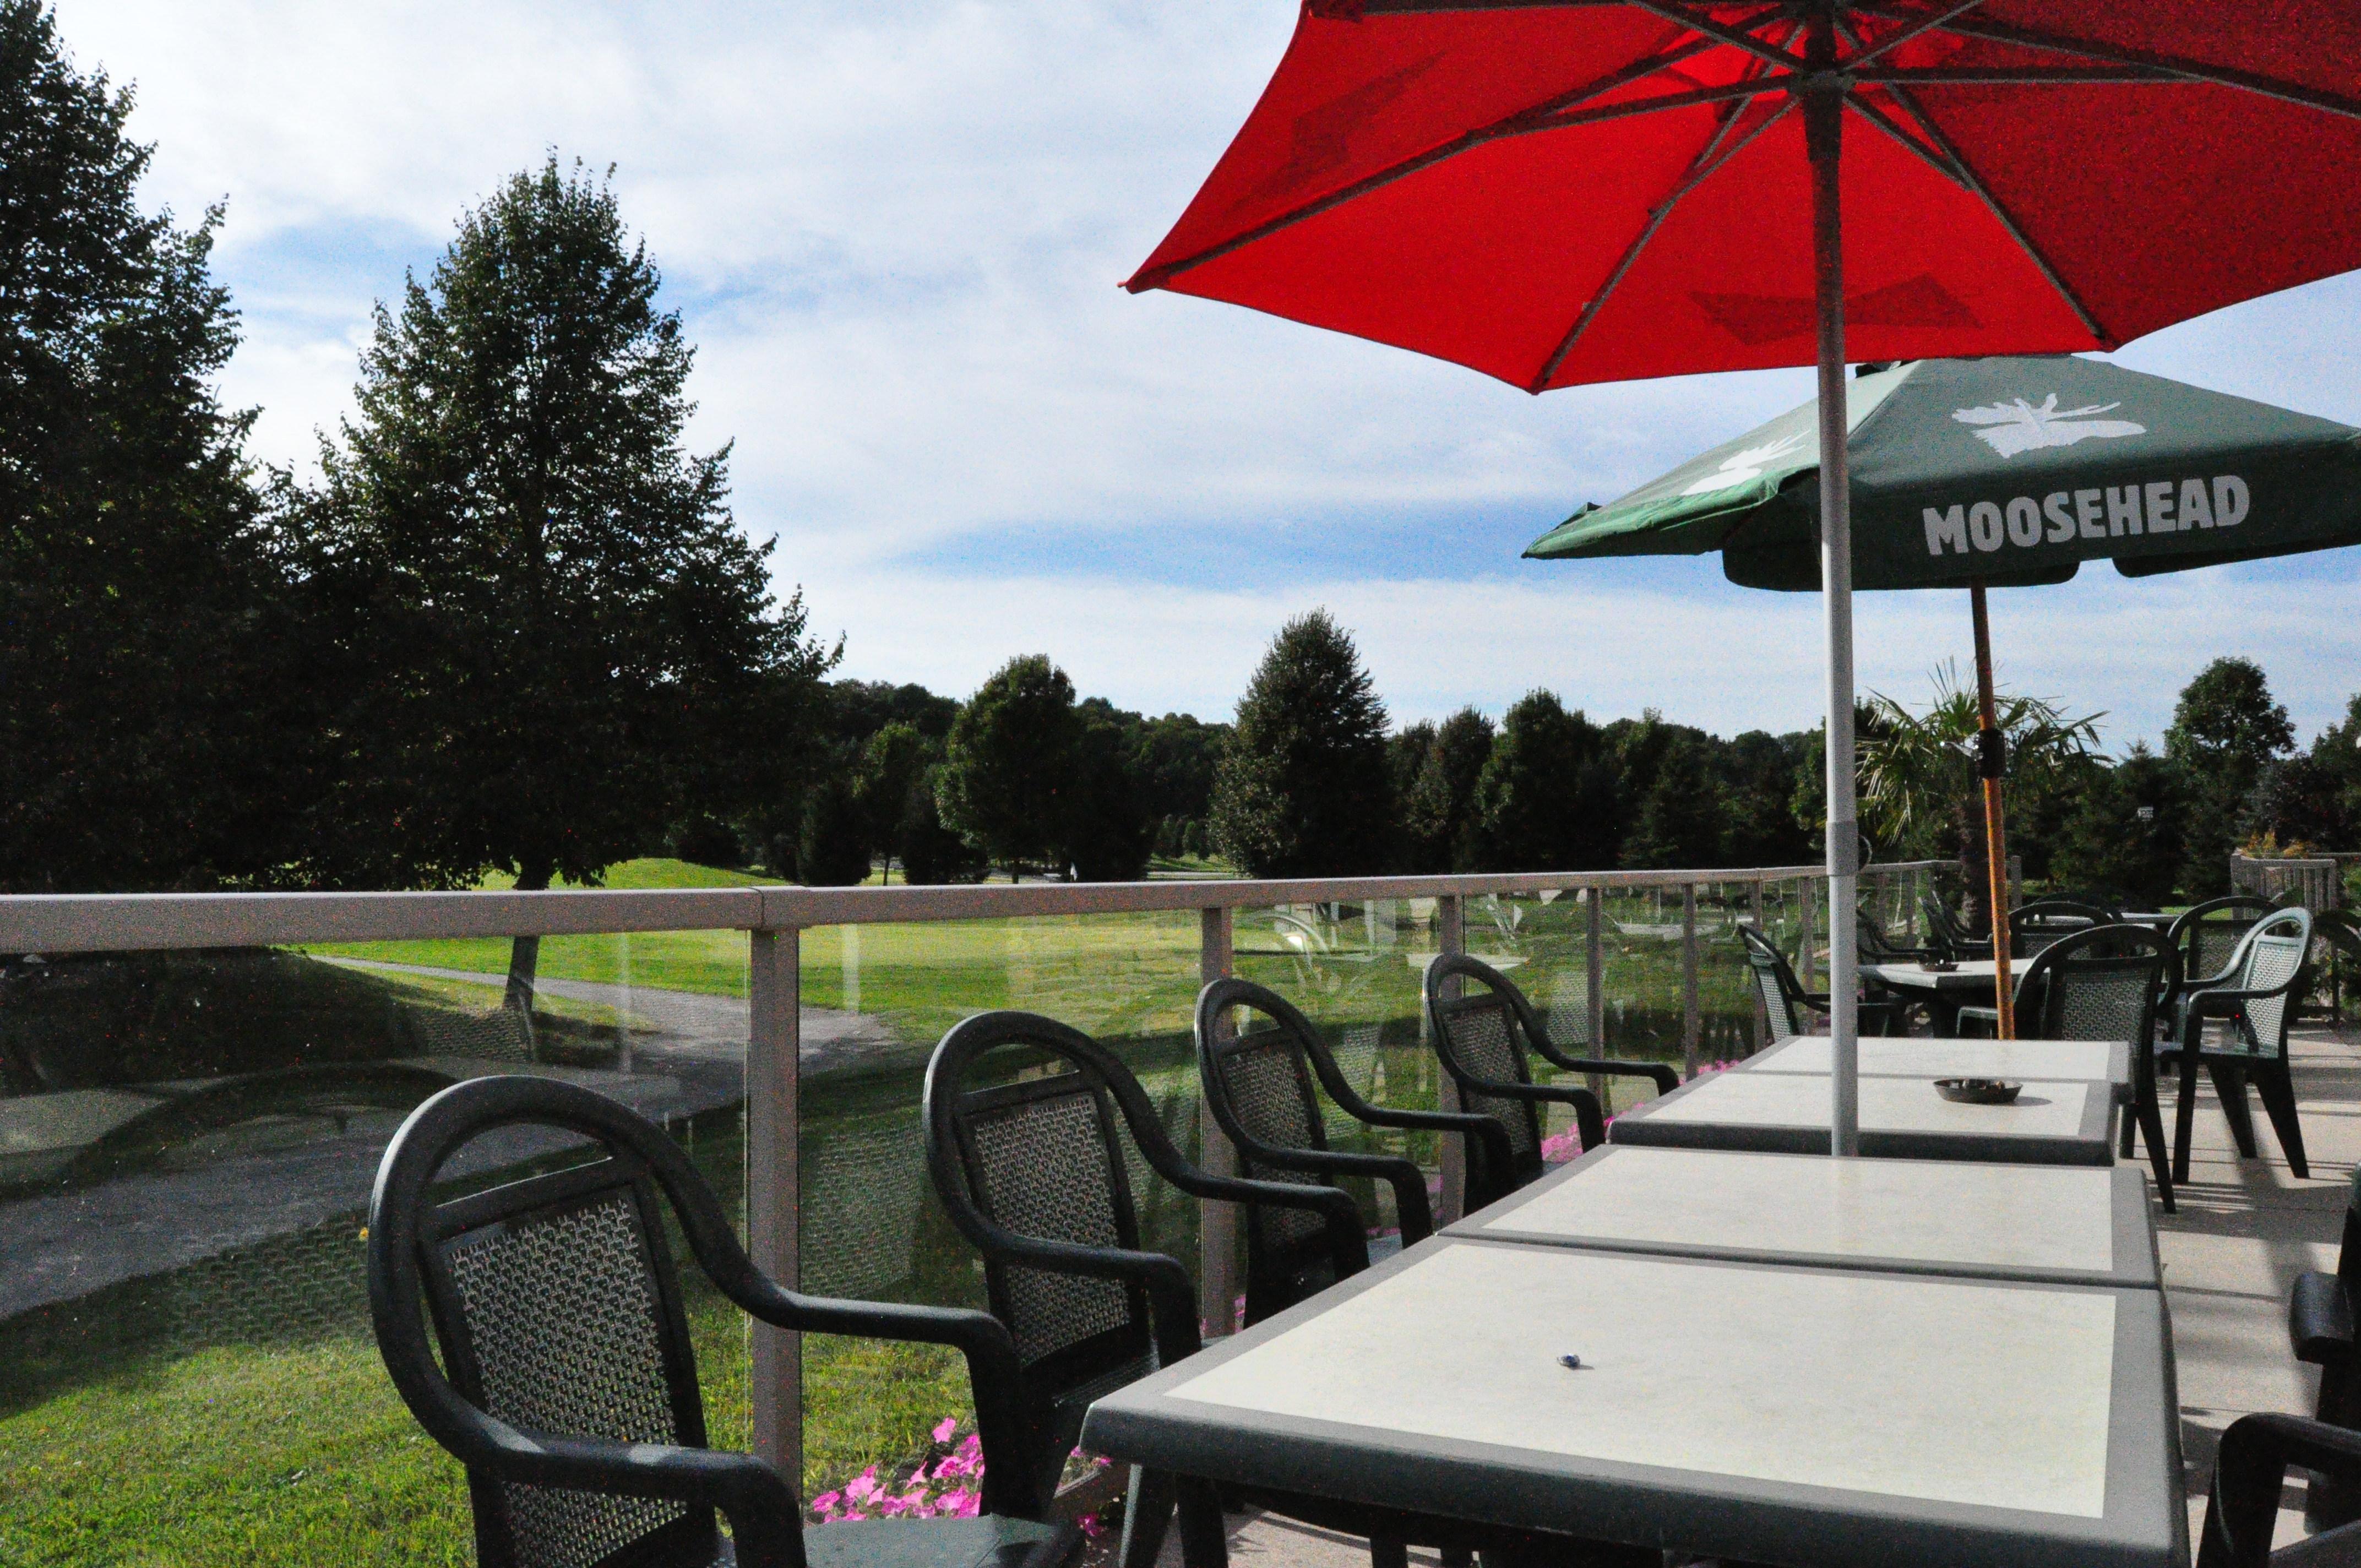 Outdoor patio, port stanley outdoor patio, summer outdoor patio, outside bar, summer patio port stanley